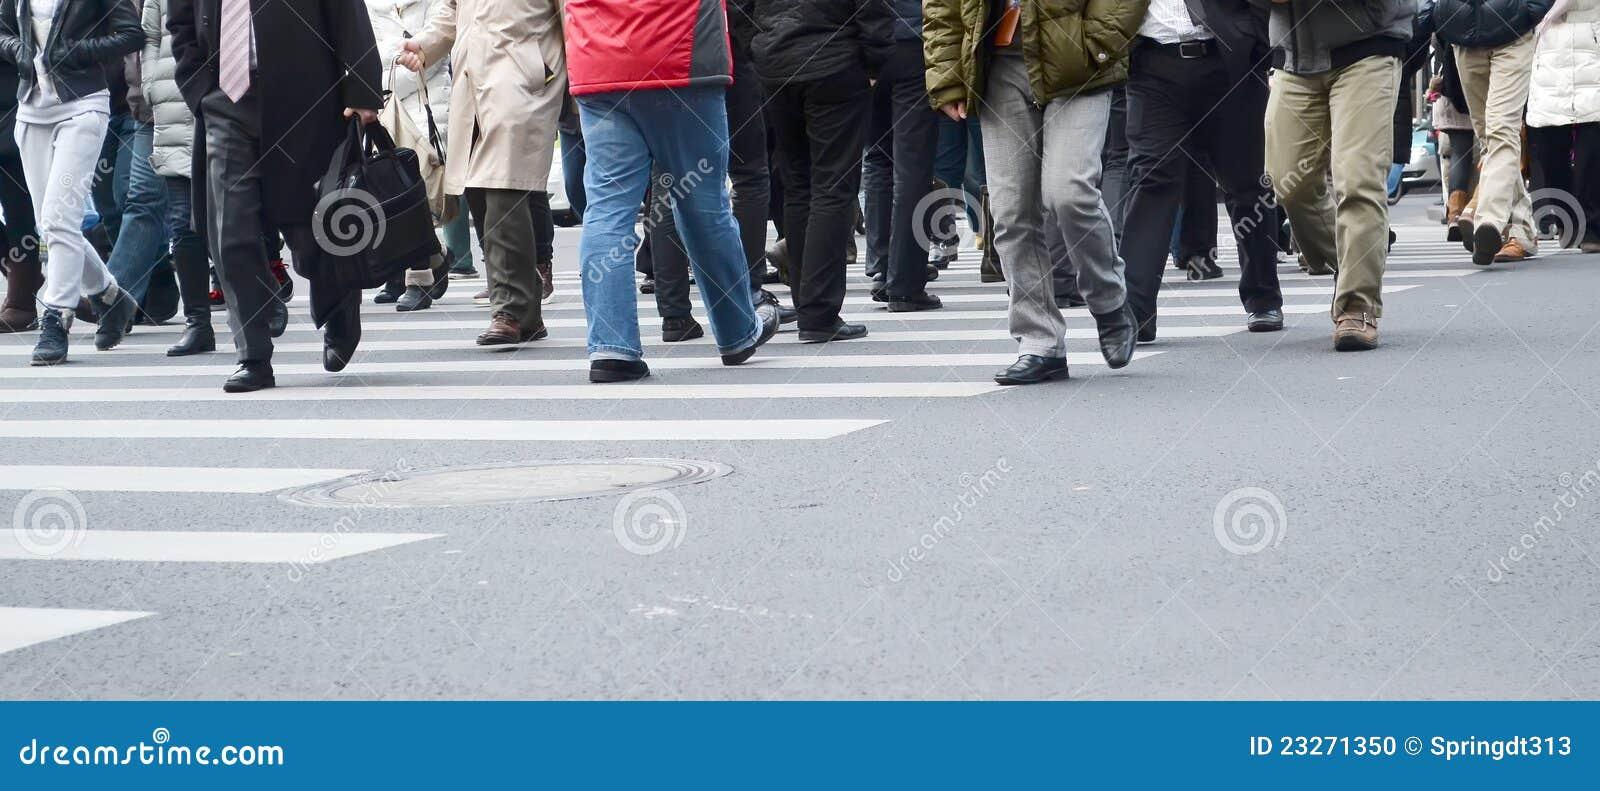 Gente ambulante occupata